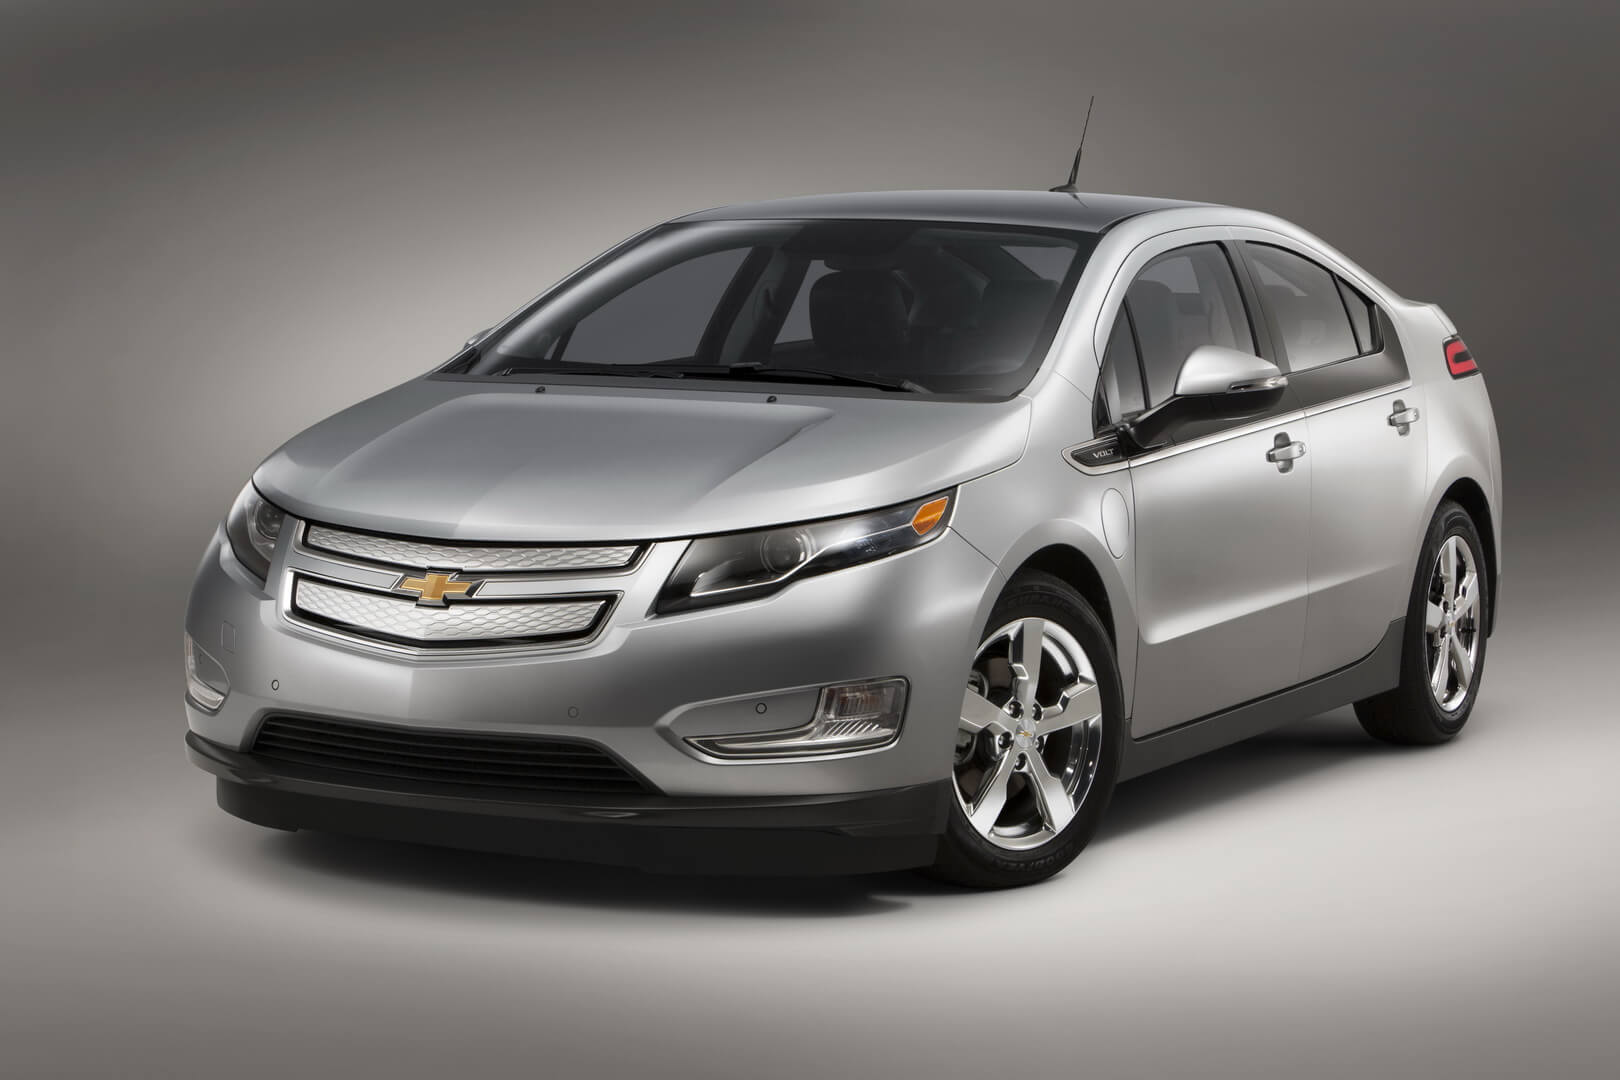 Chevrolet Volt 2010